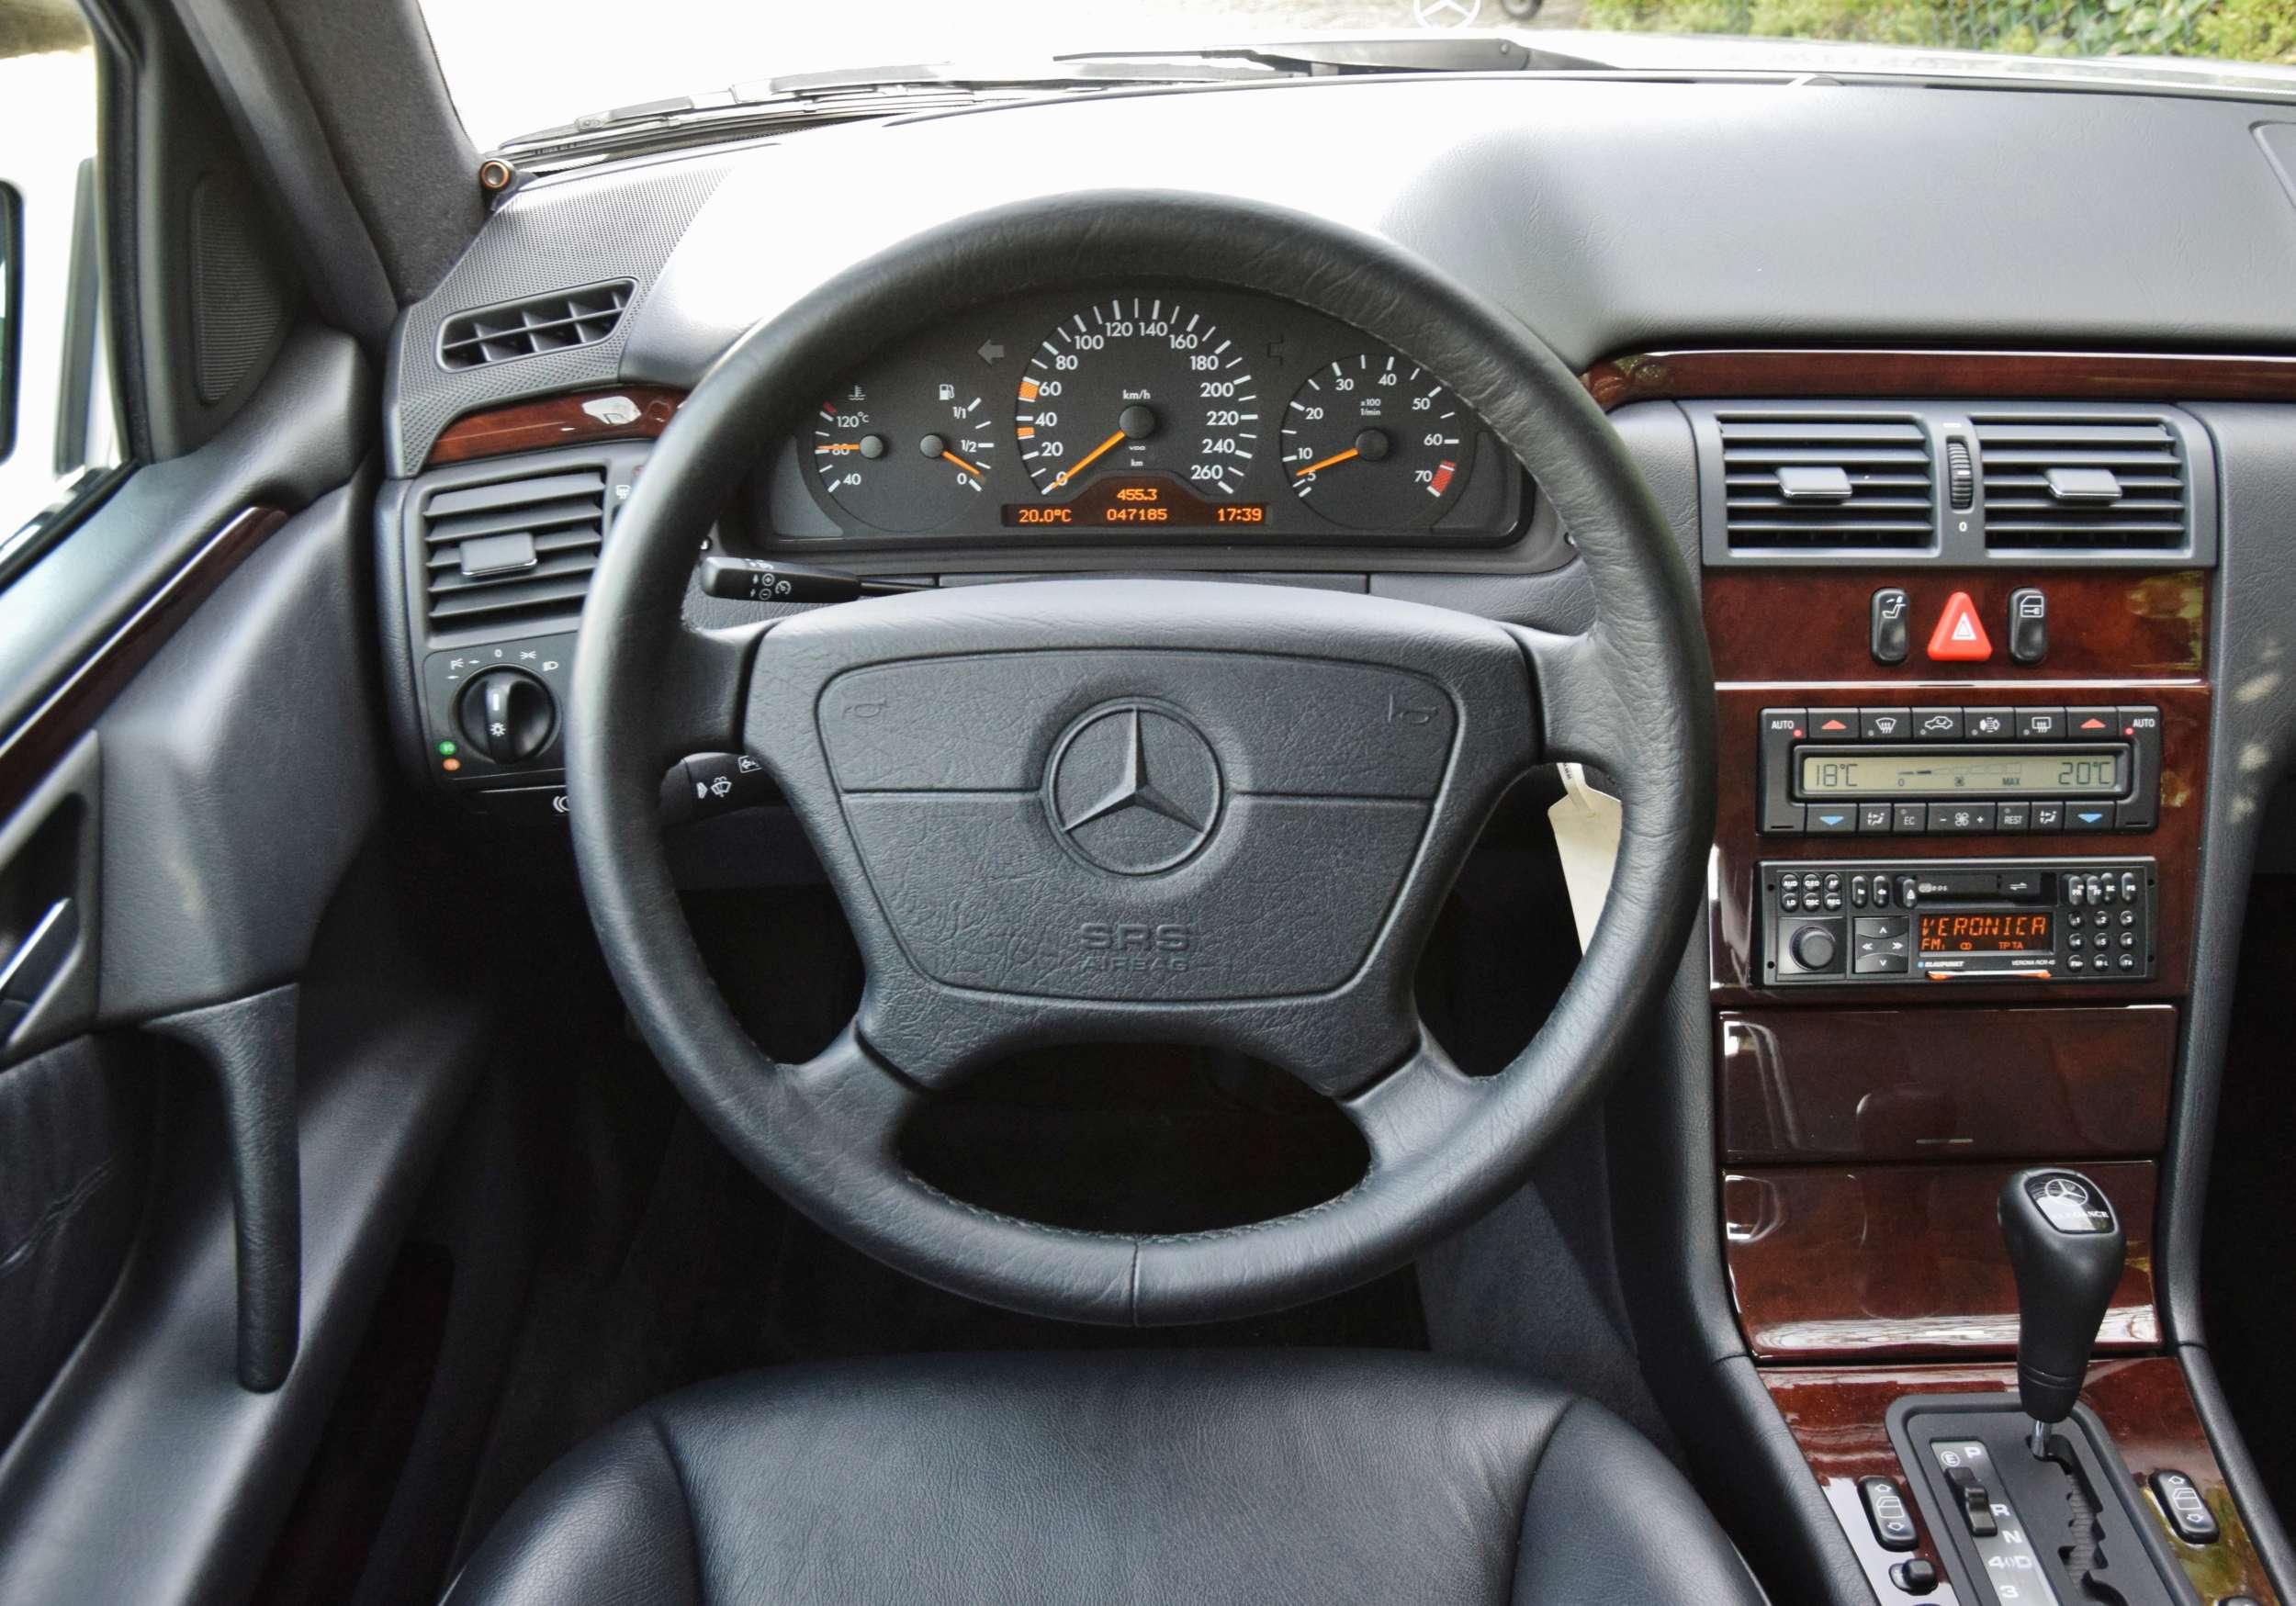 Mercedes E320 30